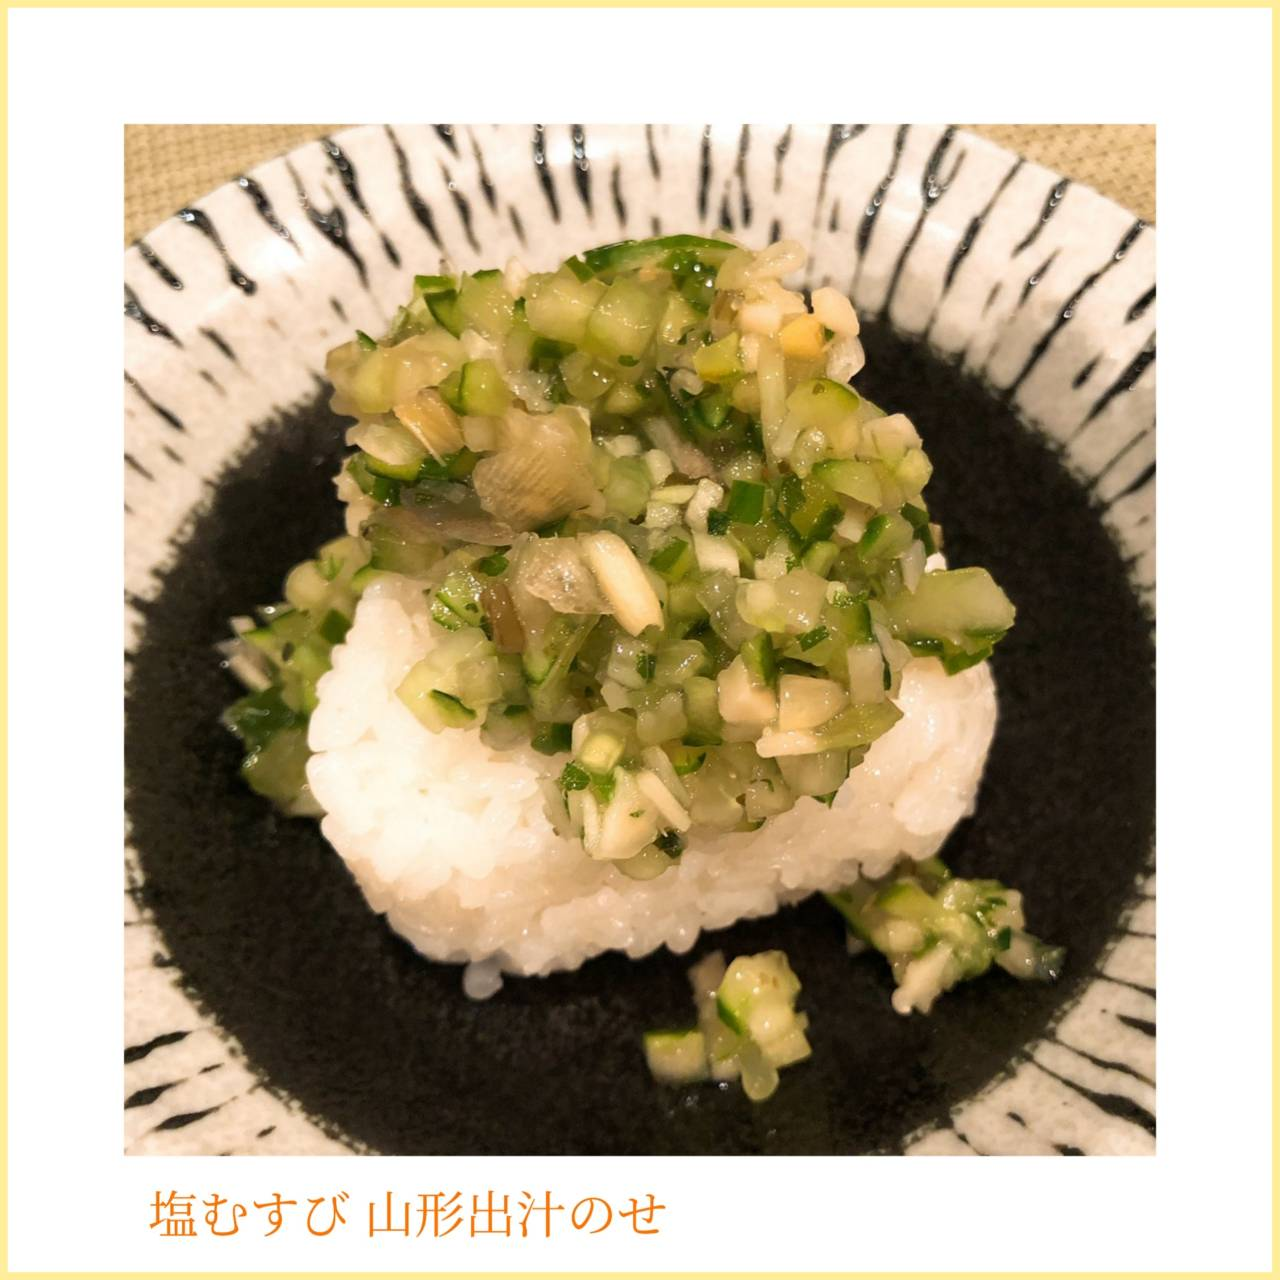 07_l_menu_item